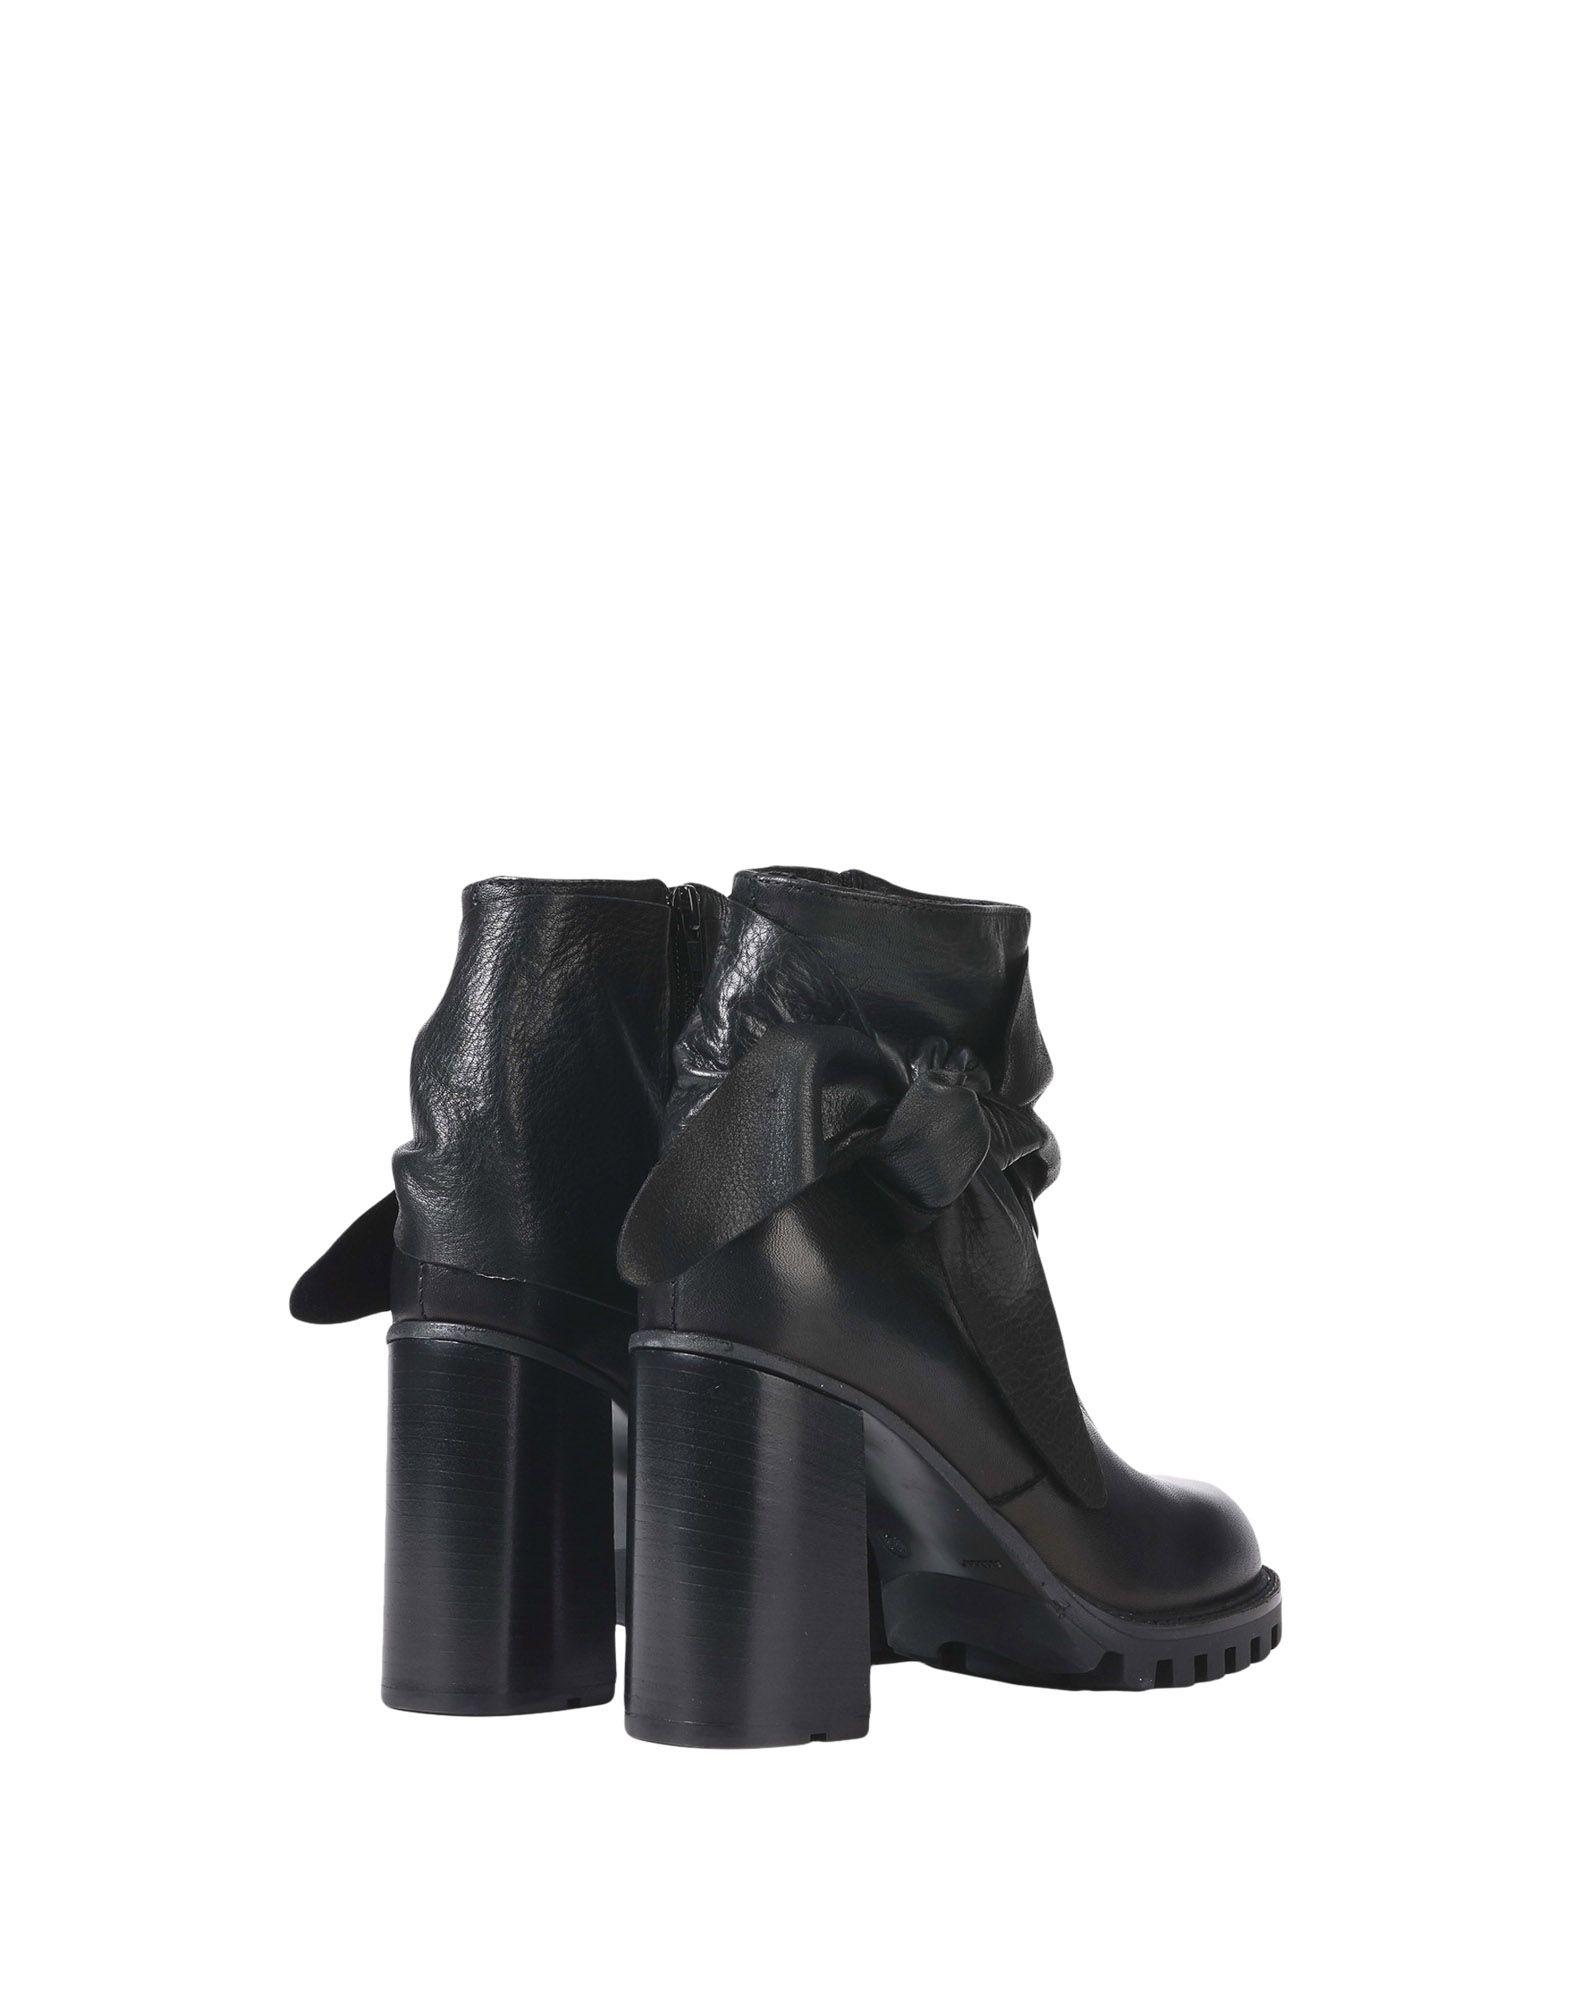 Stilvolle billige Schuhe  Fabrizio Chini Stiefelette Damen  Schuhe 11535383XL 445ef3